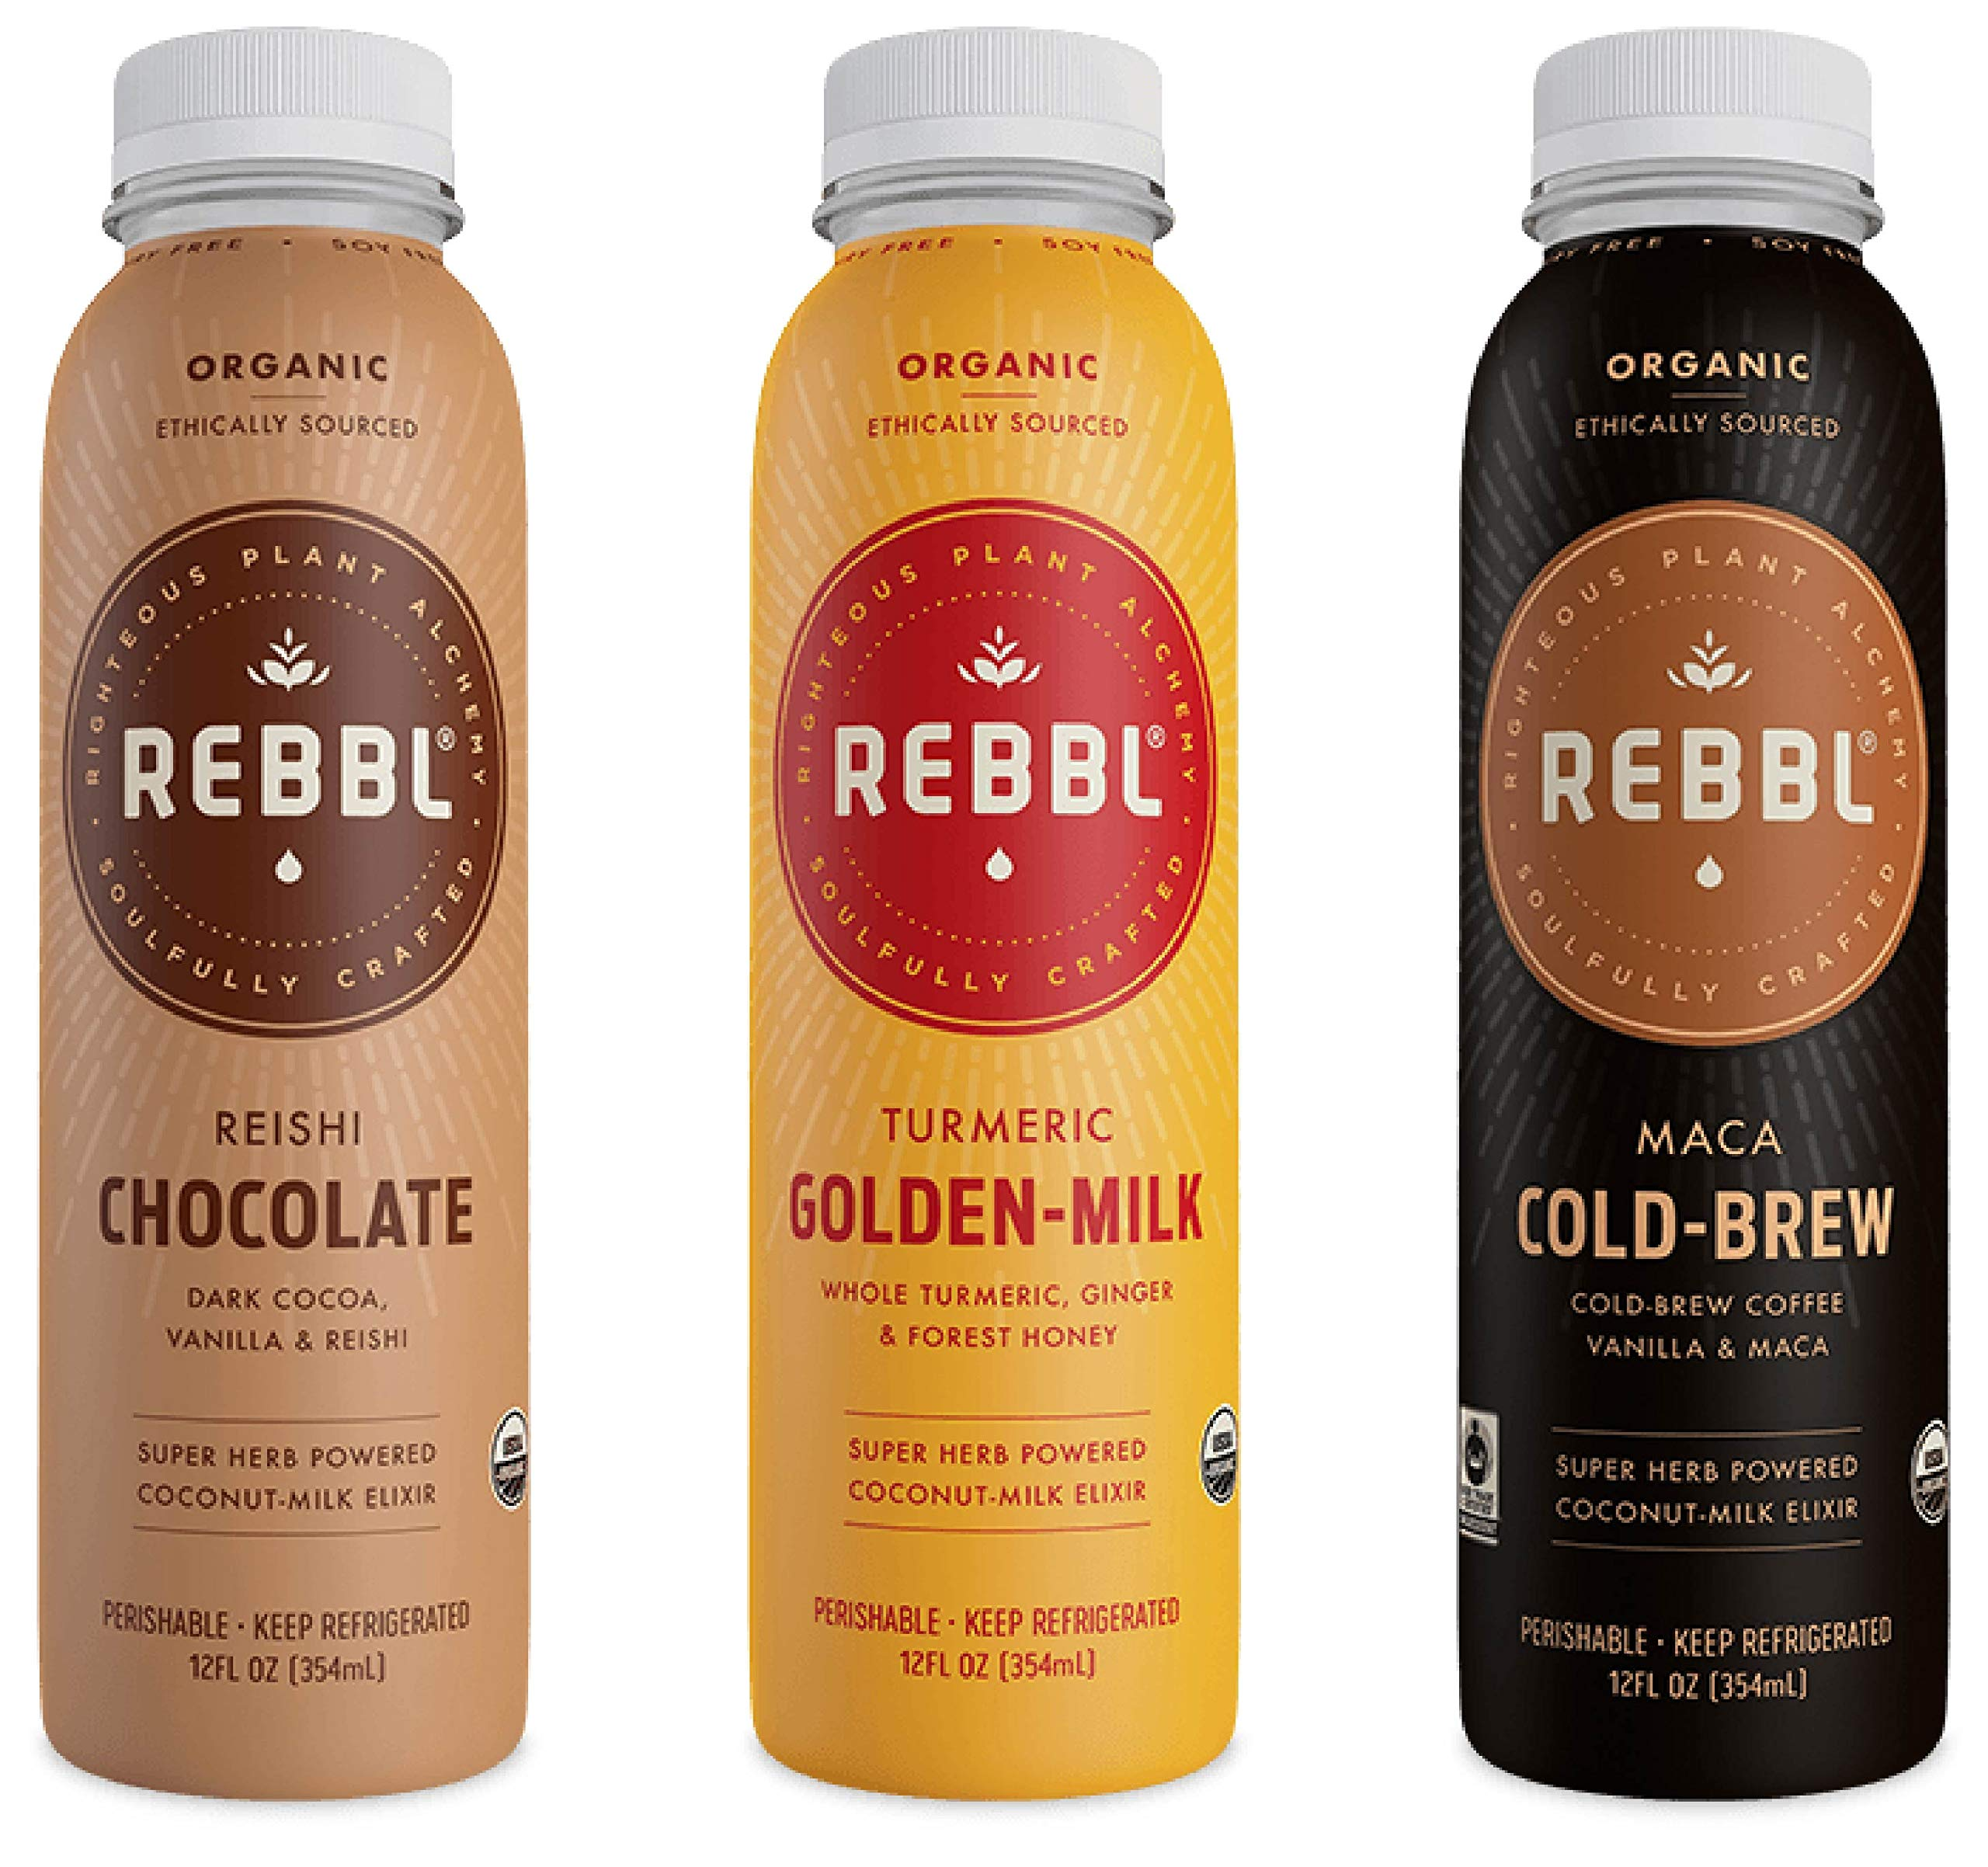 Rebbl Super Herb Powered Coconut-Milk Elixir Variety Pack, 2 of each Flavor (6 Pack)